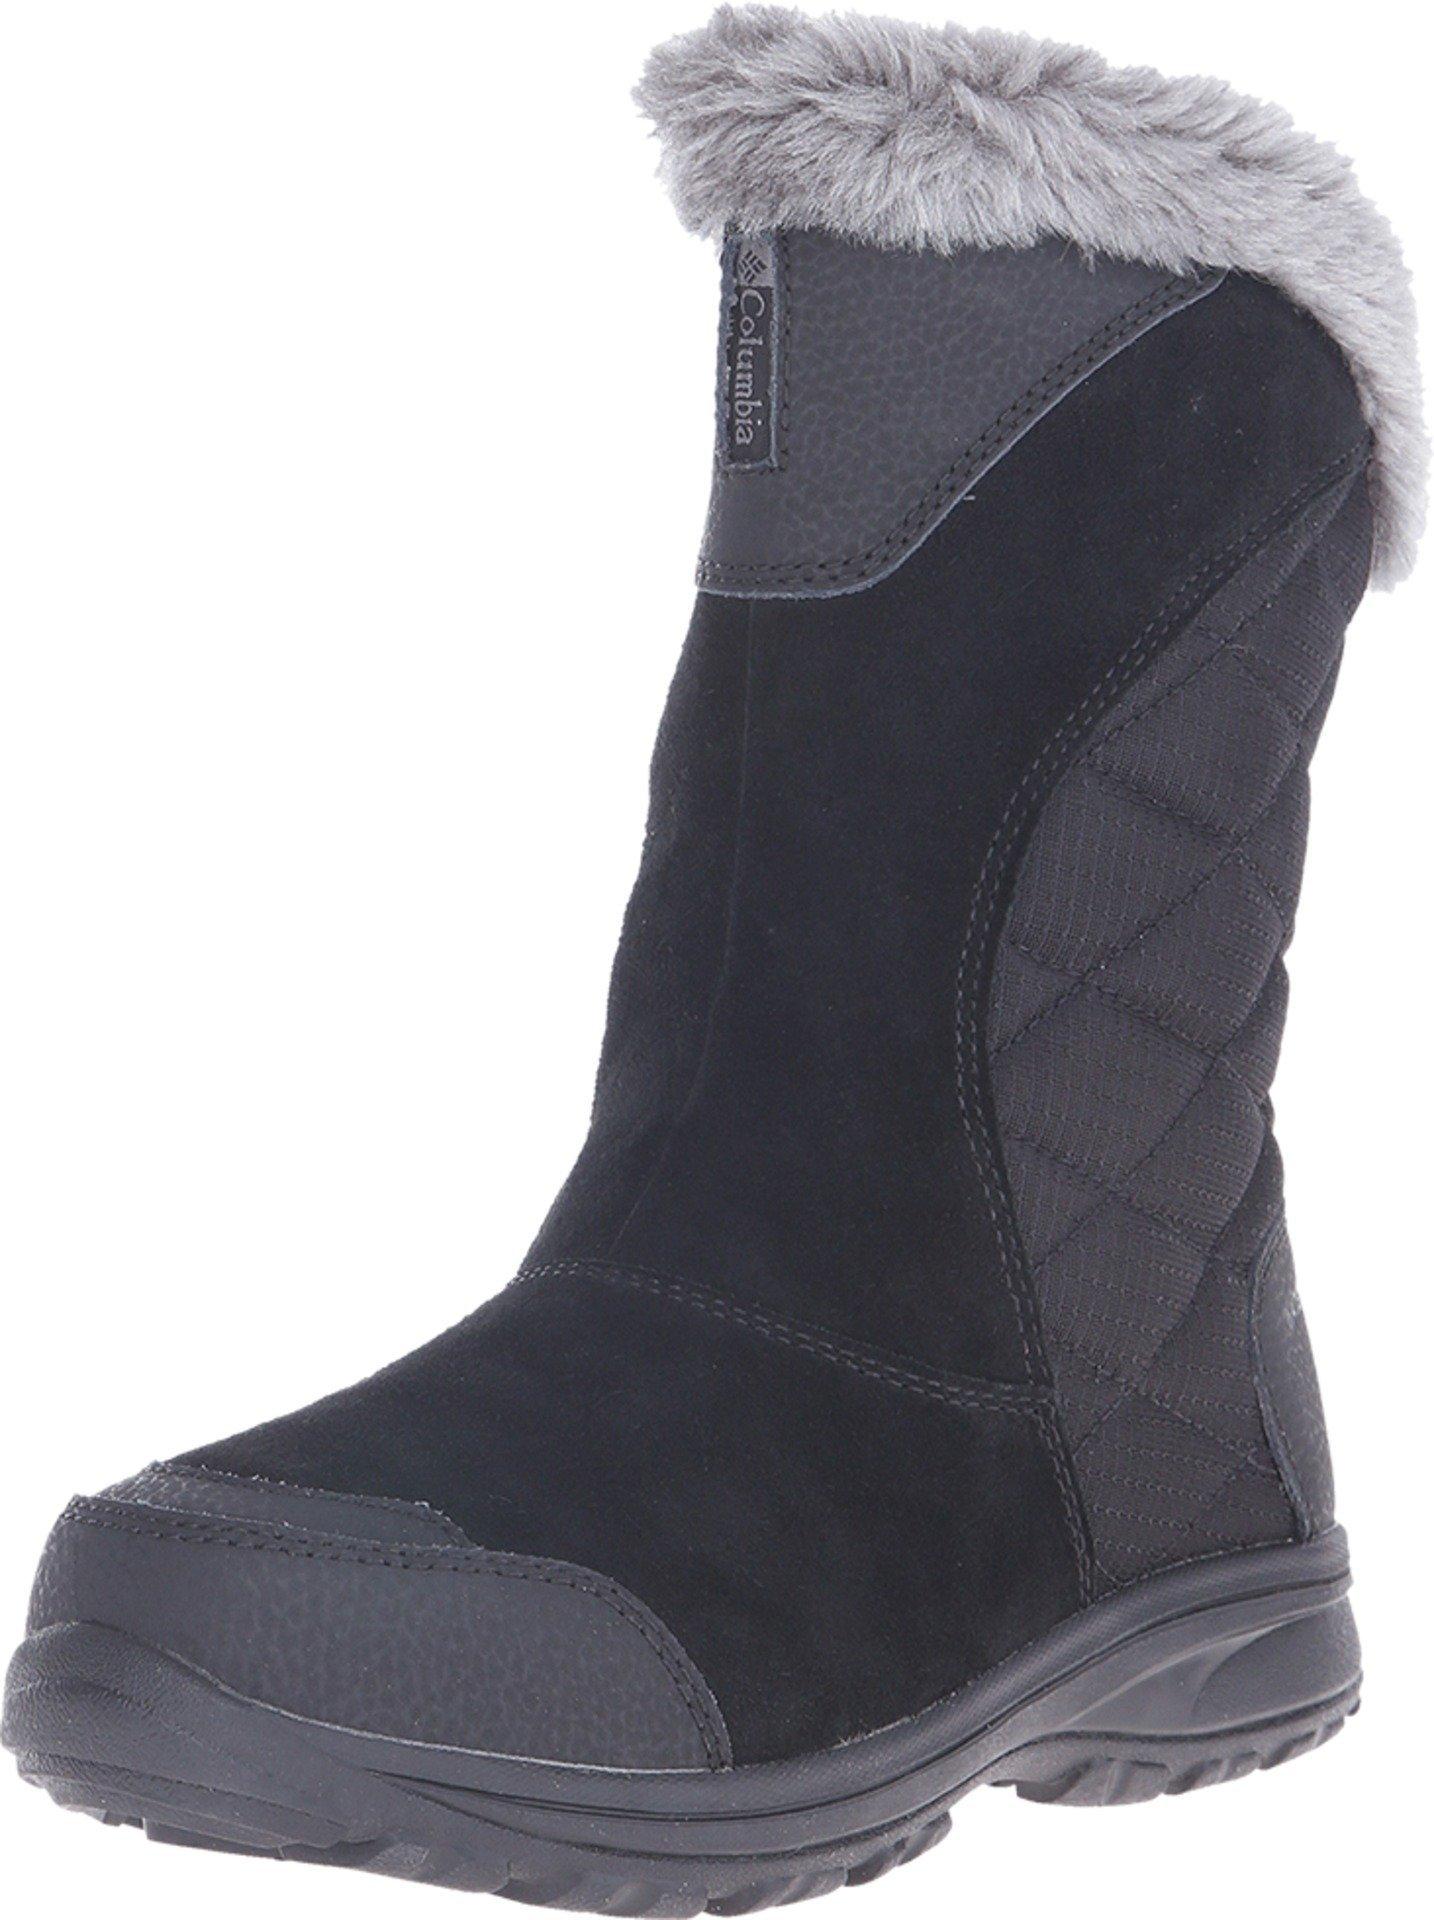 Columbia Women's Ice Maiden Ii Slip Snow Boot, Black, Shale, 8 B US